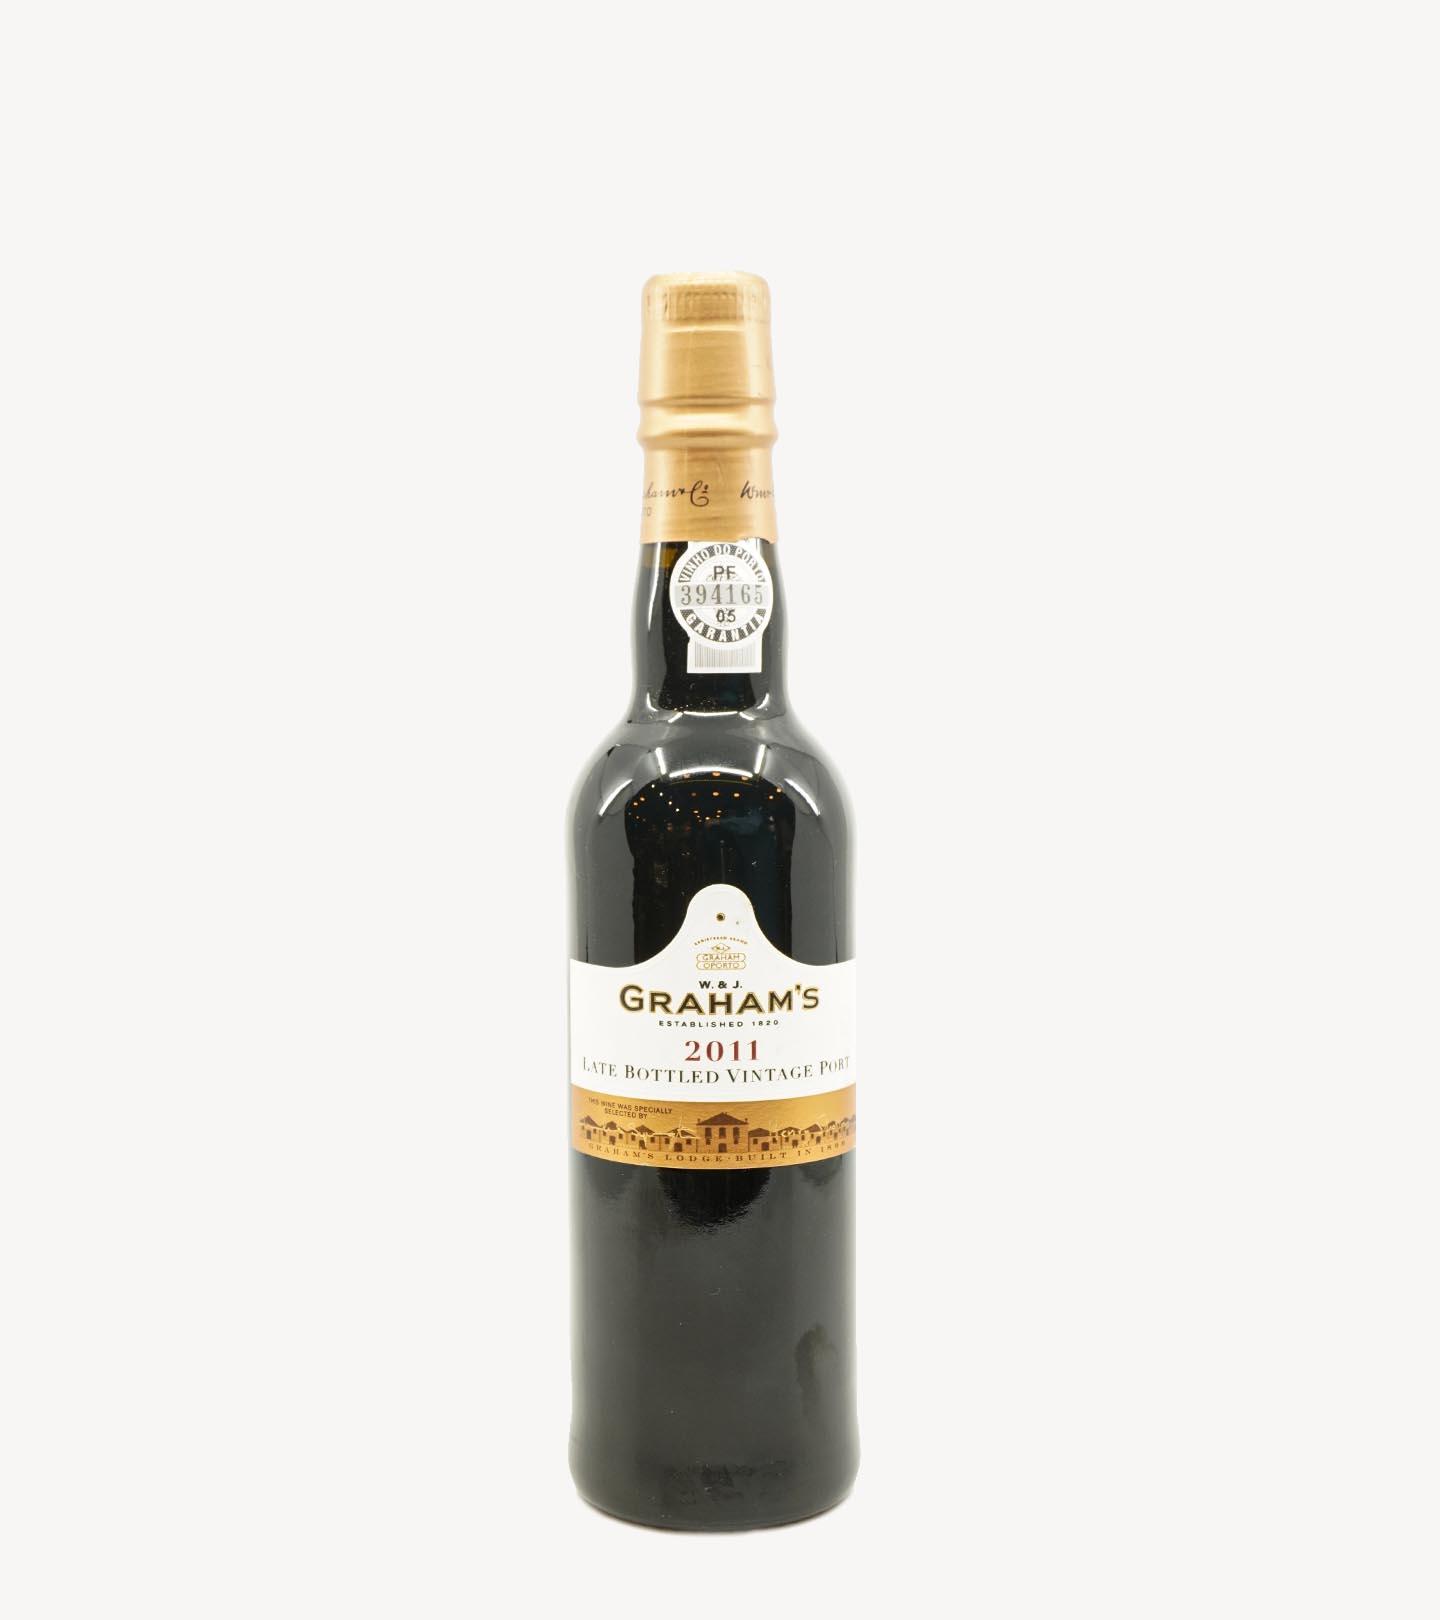 Vinho do Porto Graham's LBV 75cl